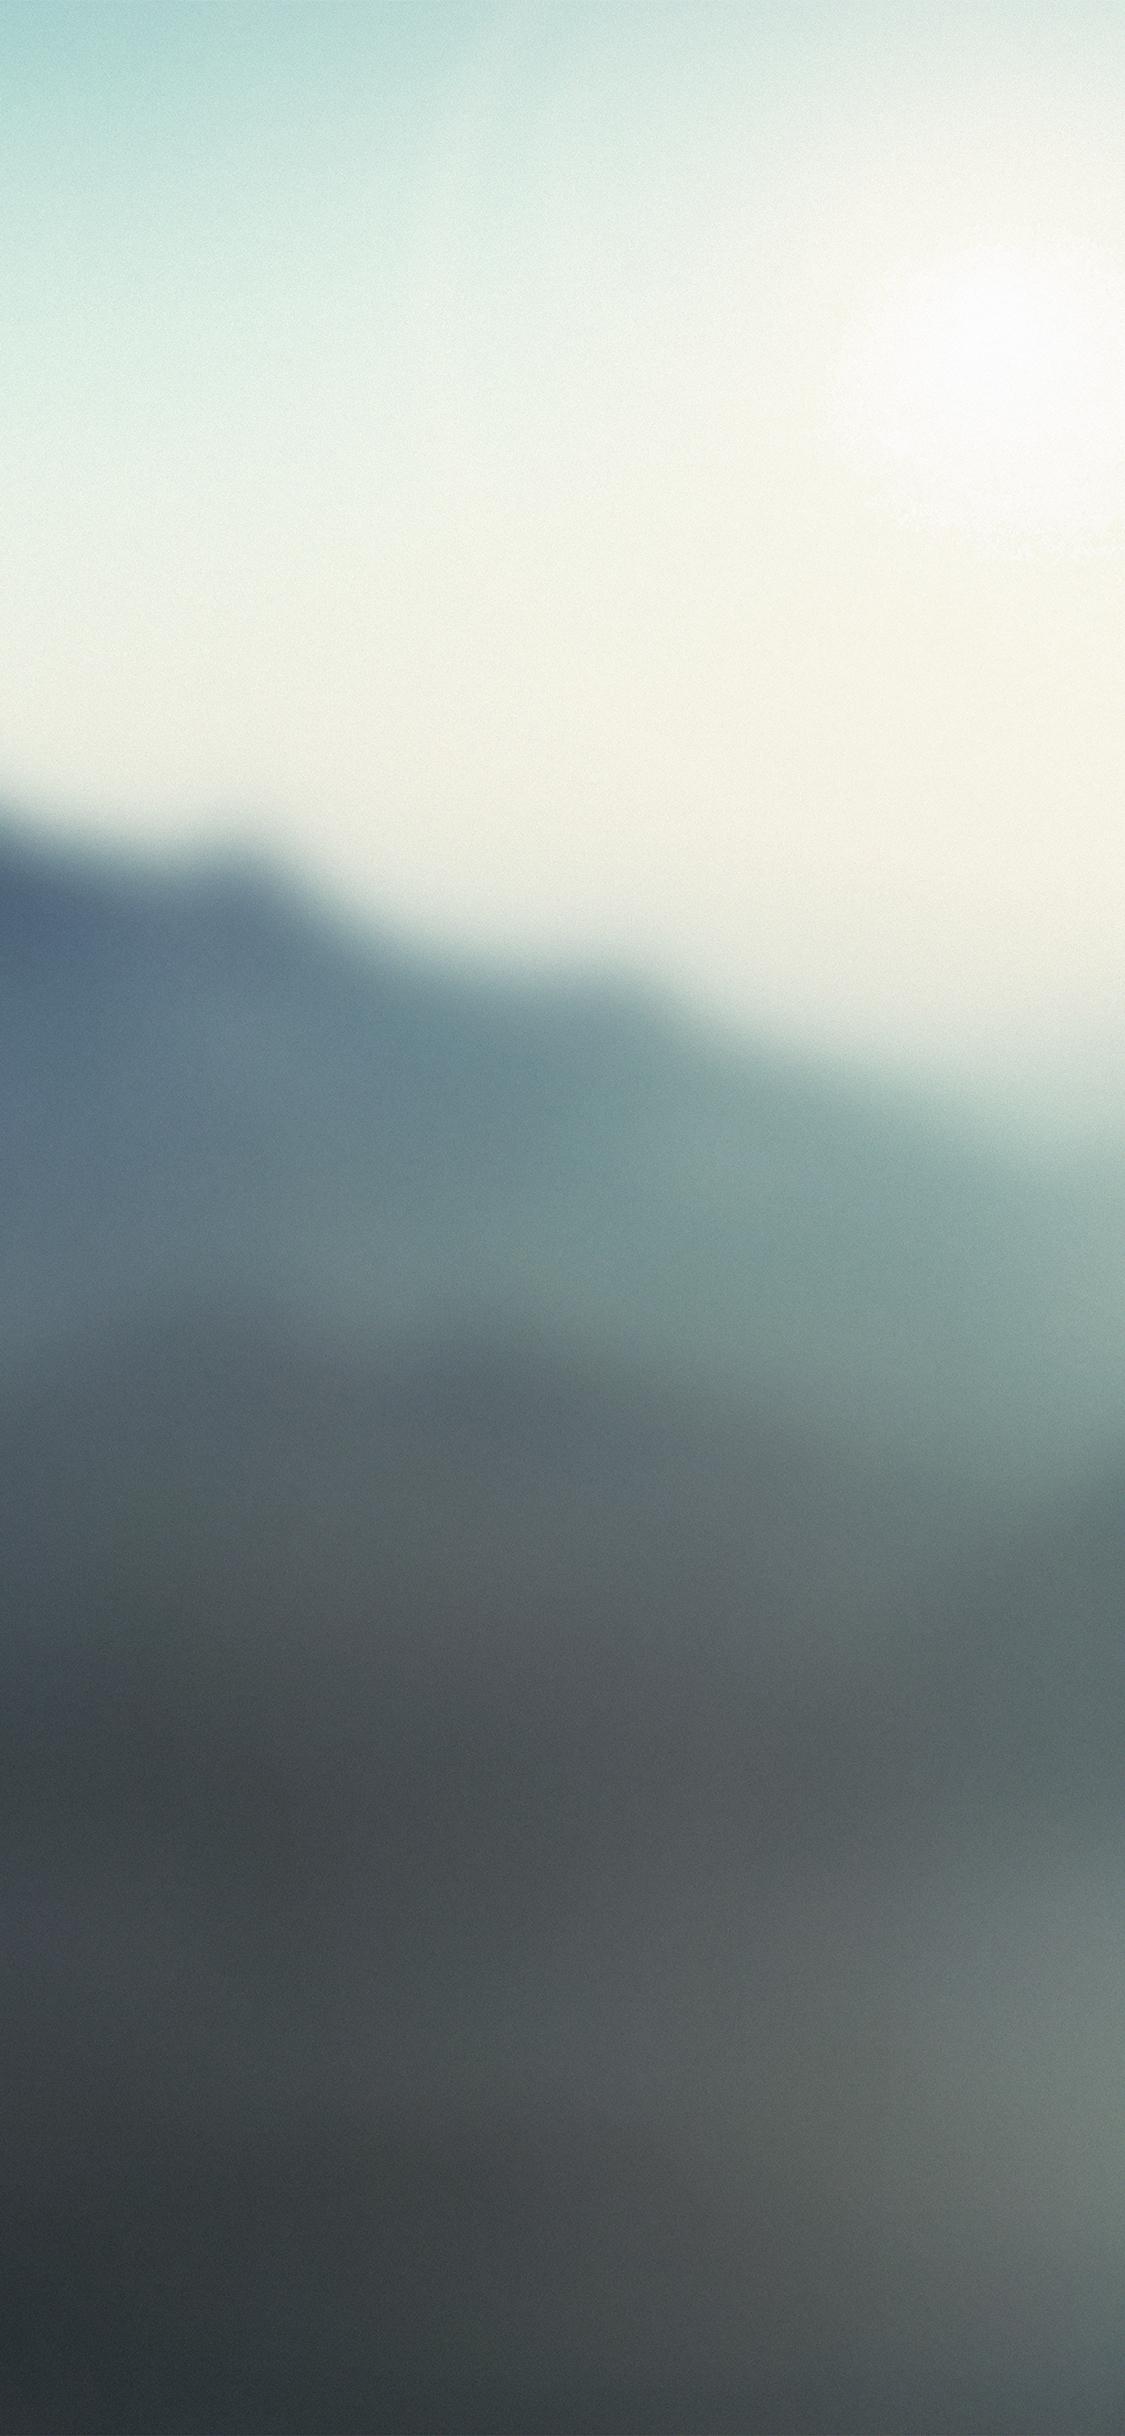 iPhoneXpapers.com-Apple-iPhone-wallpaper-ae60-mountain-sun-lights-blur-bokeh-shiny